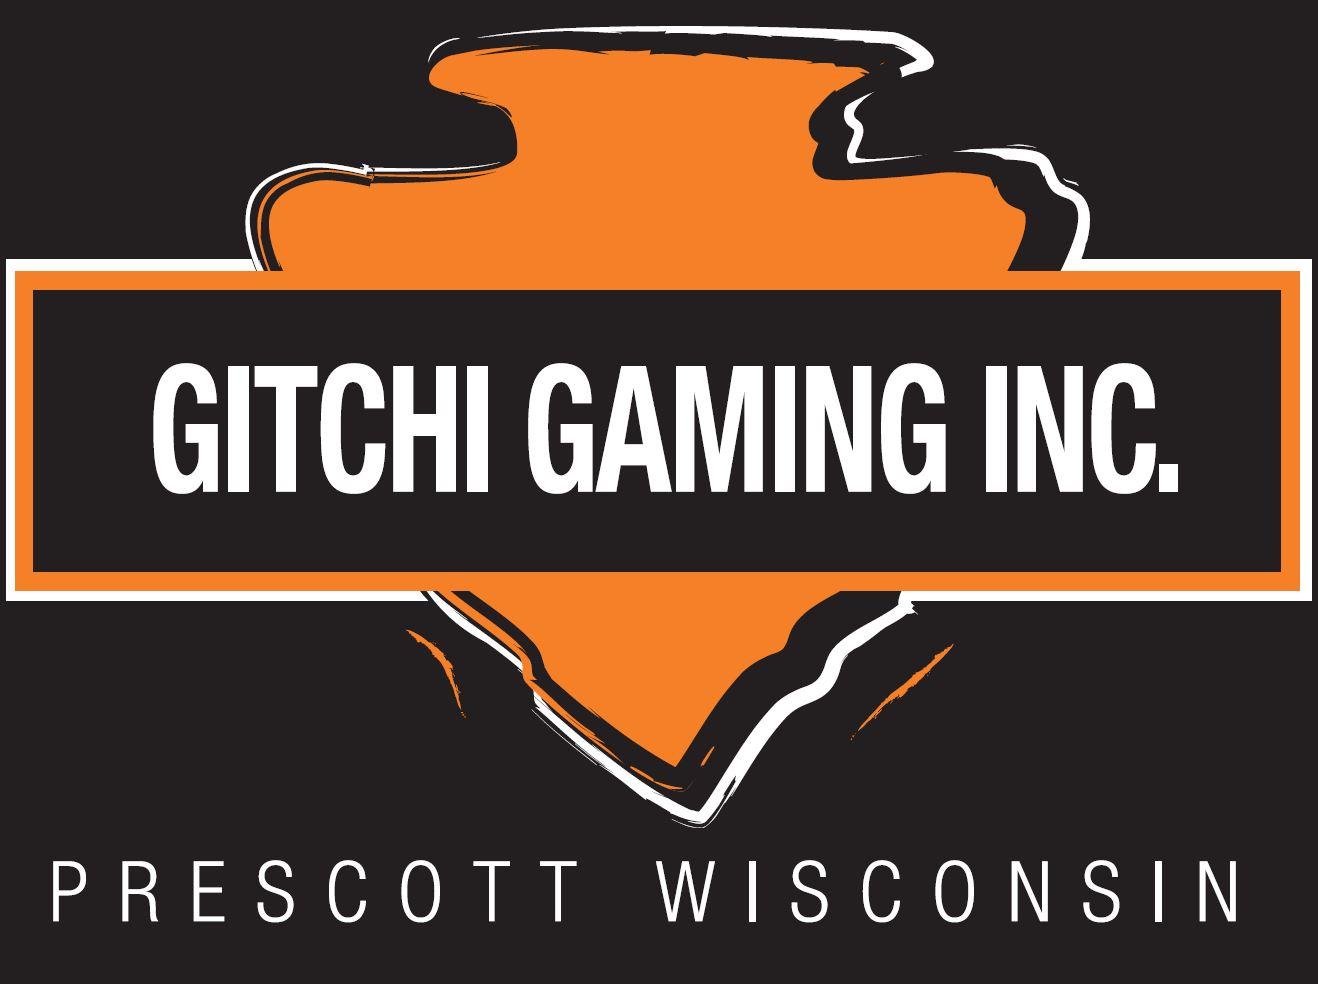 Gitchi Gaming, Inc.